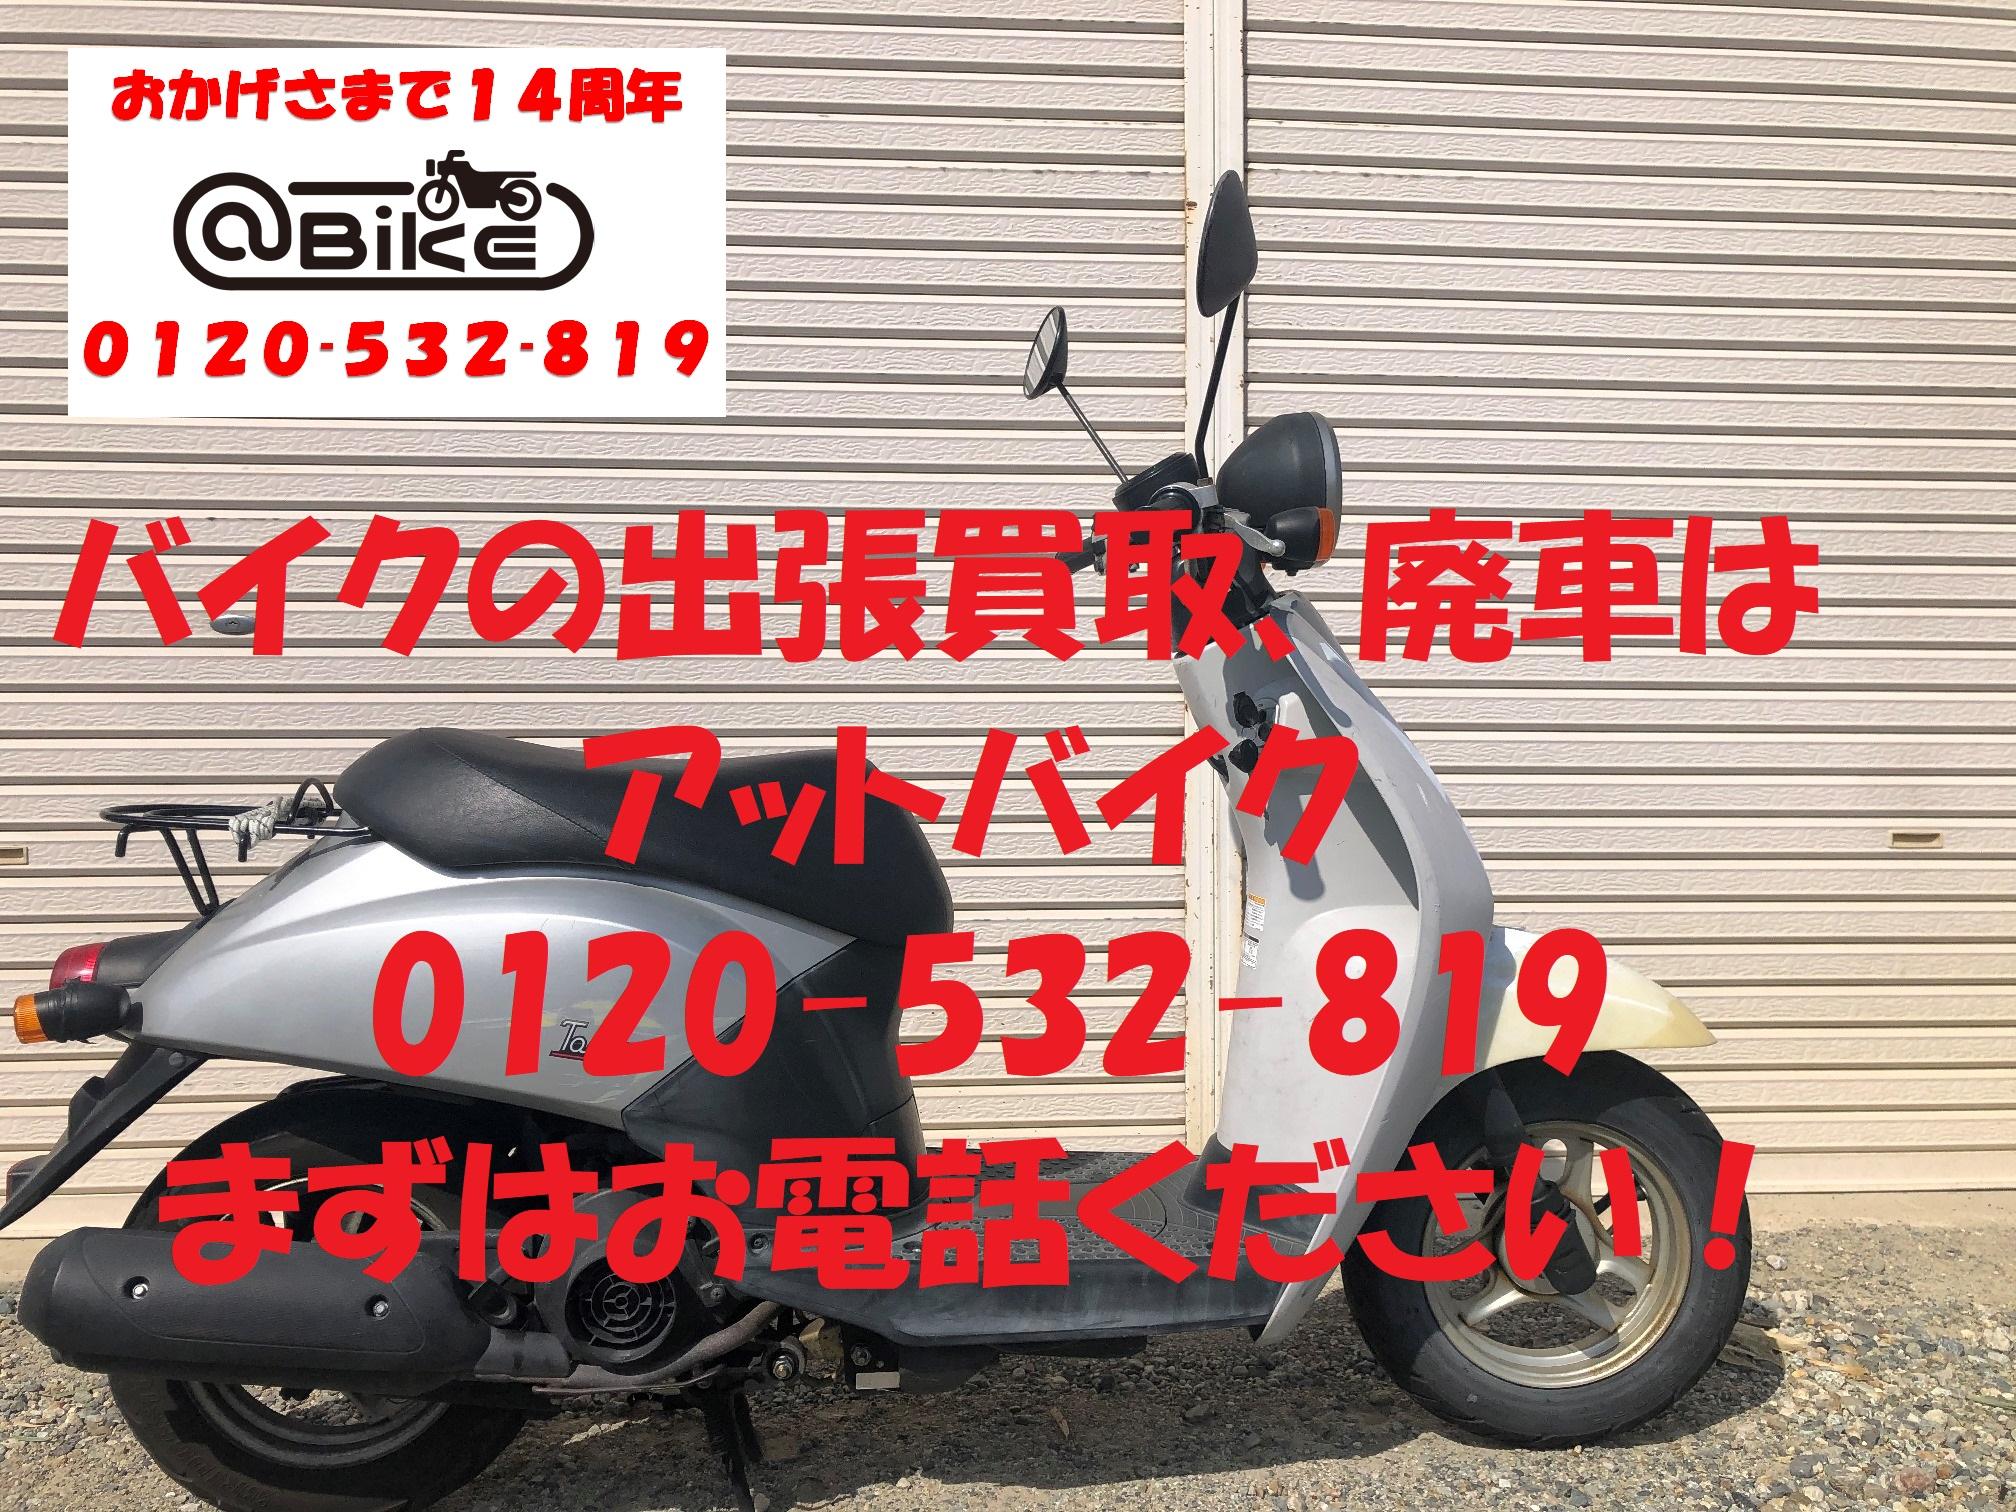 AF61トゥディのバイク出張買取、廃車はアットバイク (2)